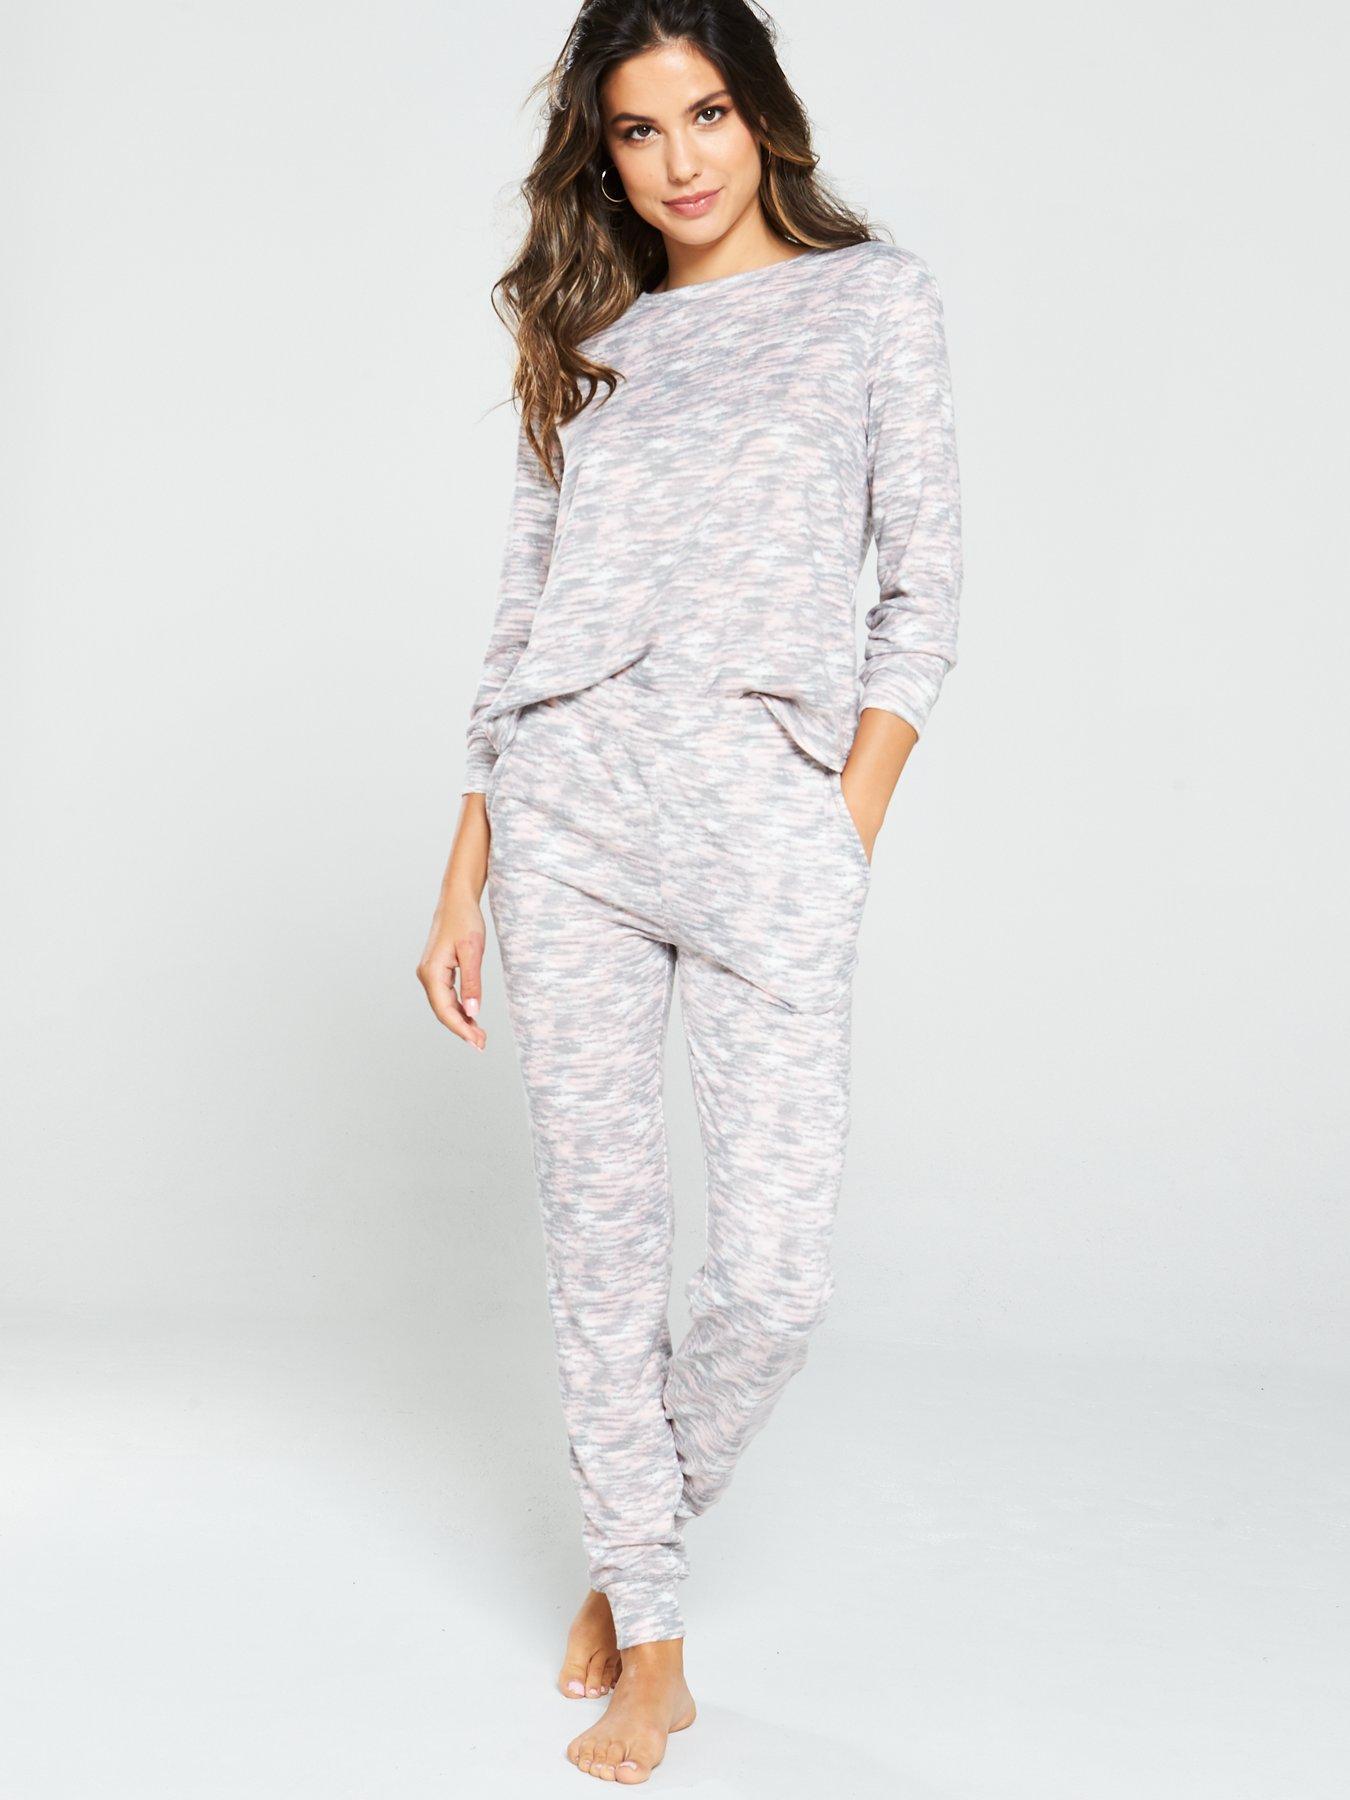 Ladies Cold Shoulder Ruffle Loungewear Suit Womens Fancy Frill Style Tracksuit Dames: kleding